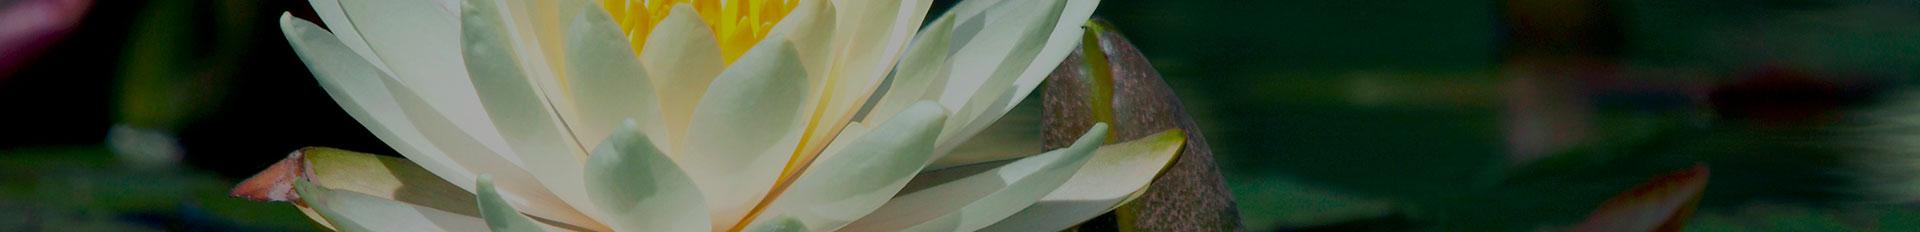 Resources | Pinecrest Memorial Gardens & Crematory